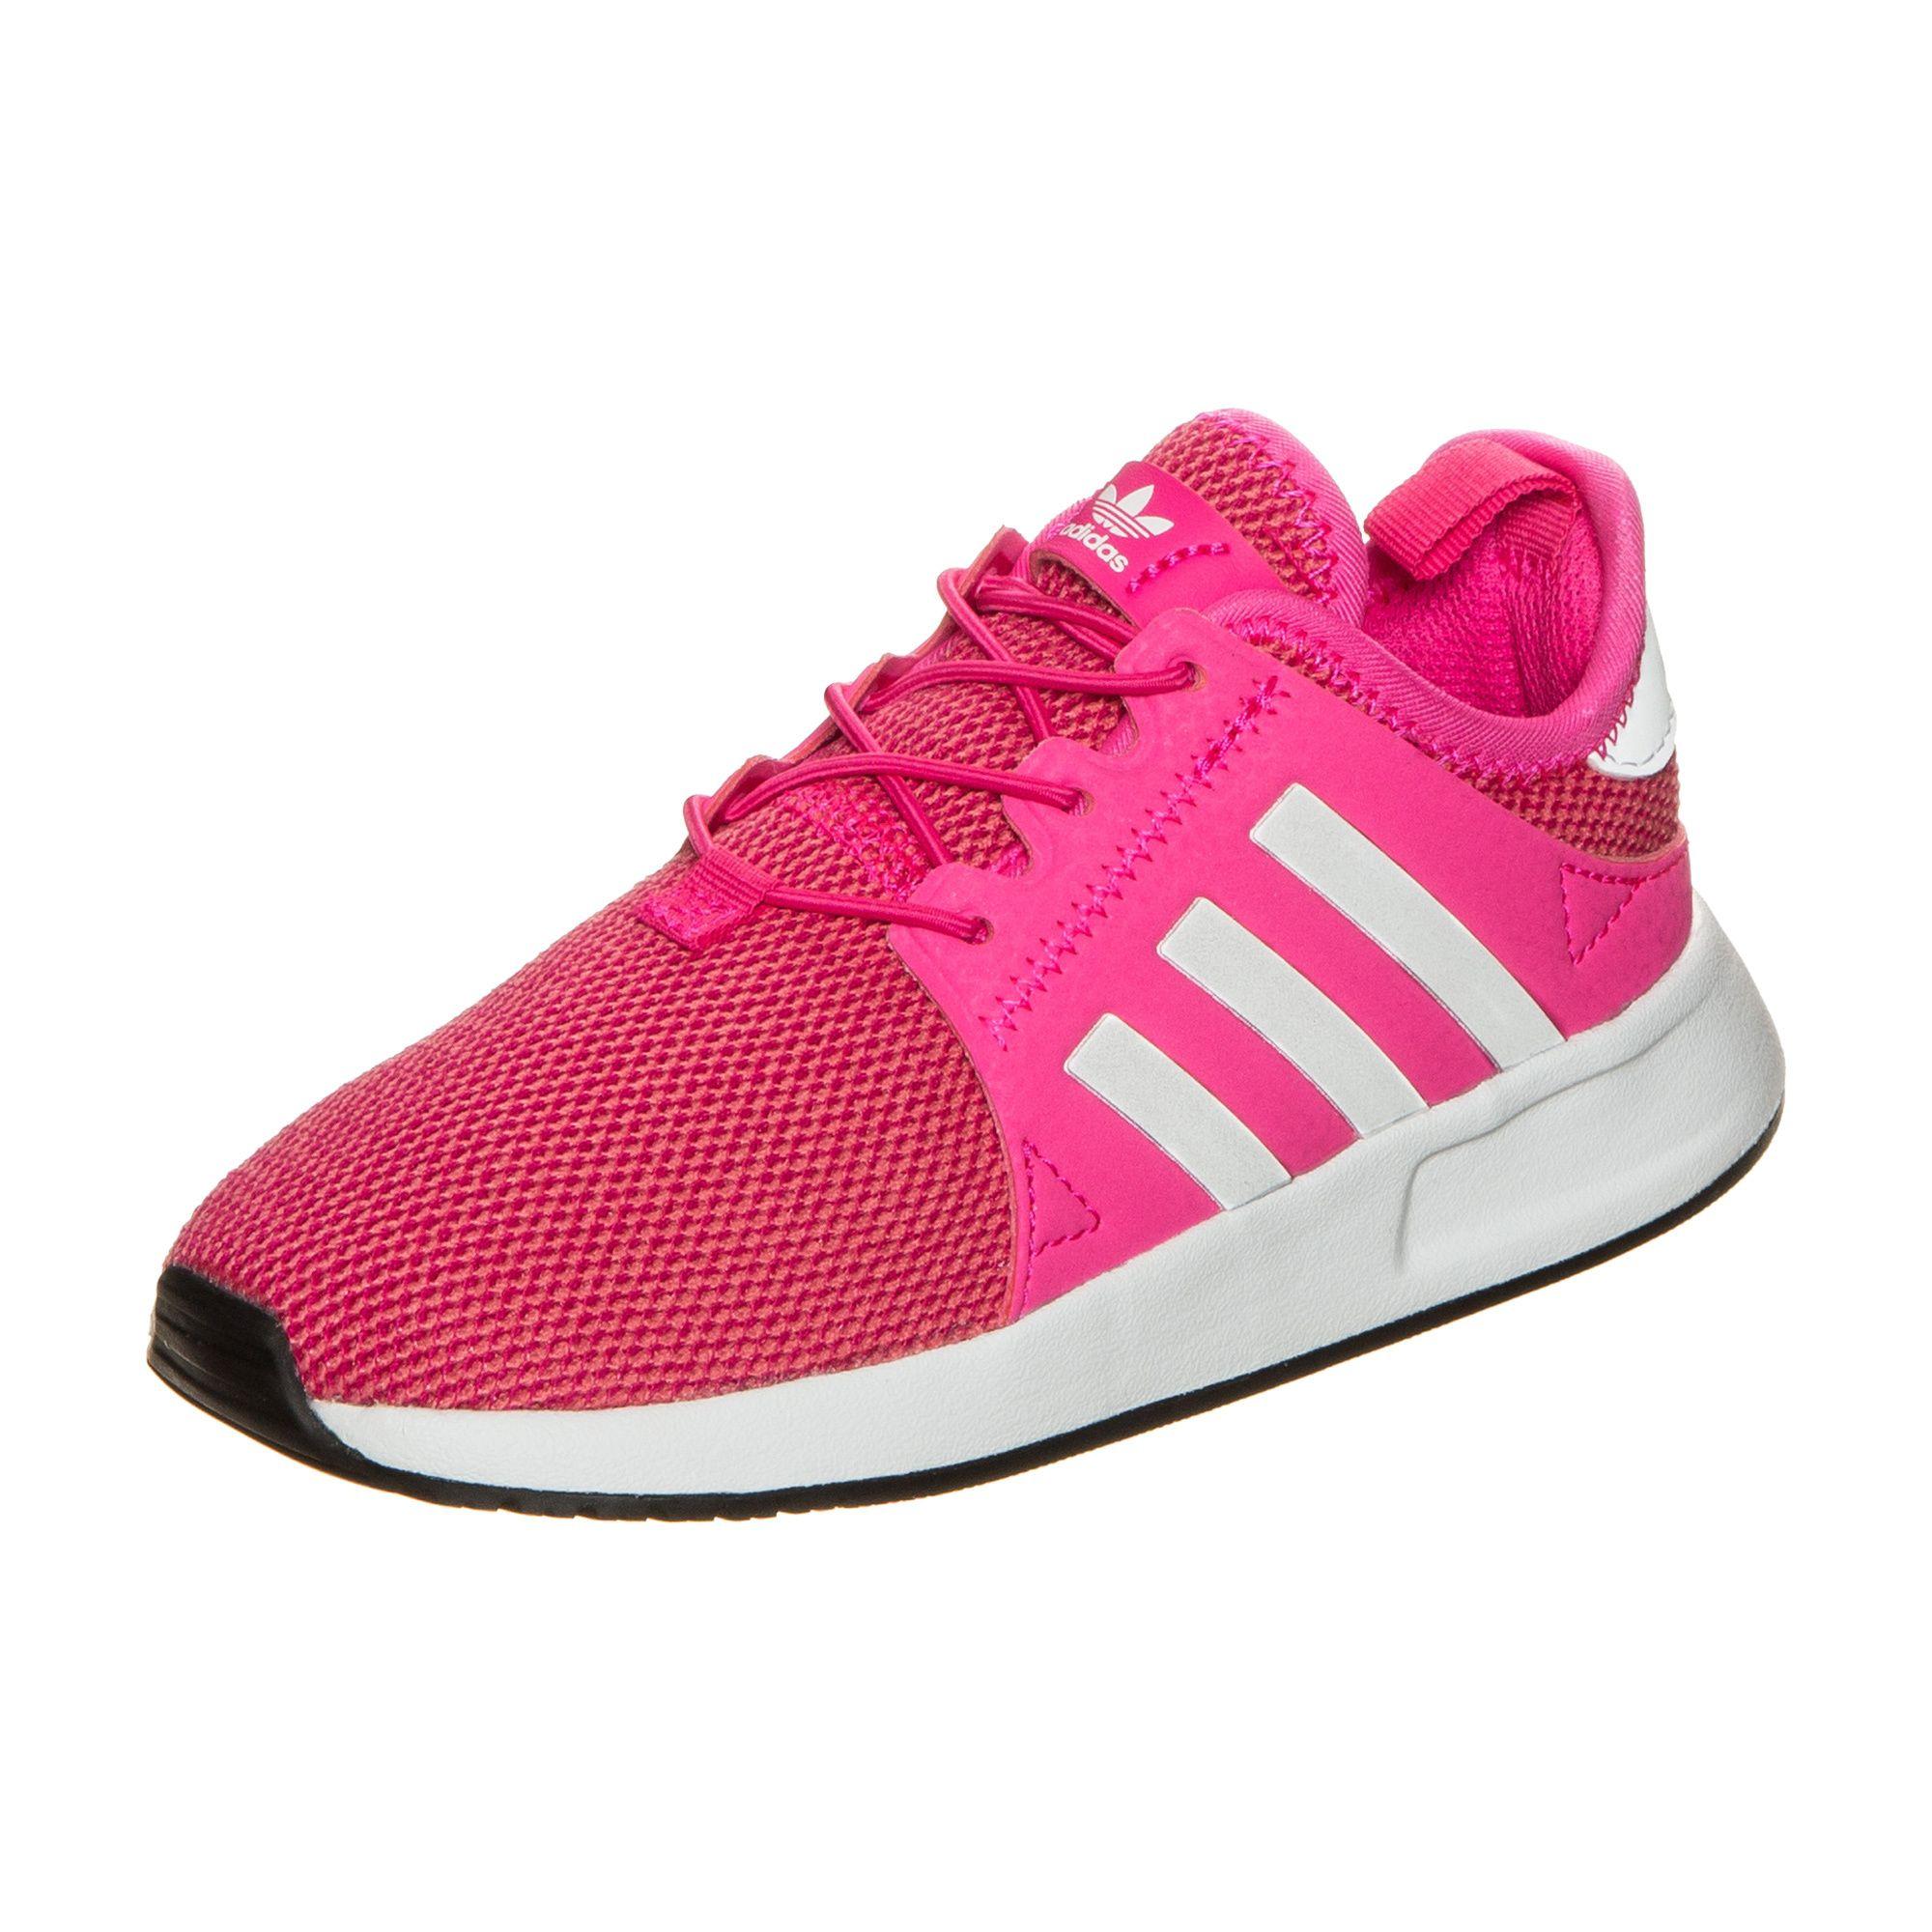 ADIDAS ORIGINALS adidas Originals X_PLR EL Sneaker Kleinkinder